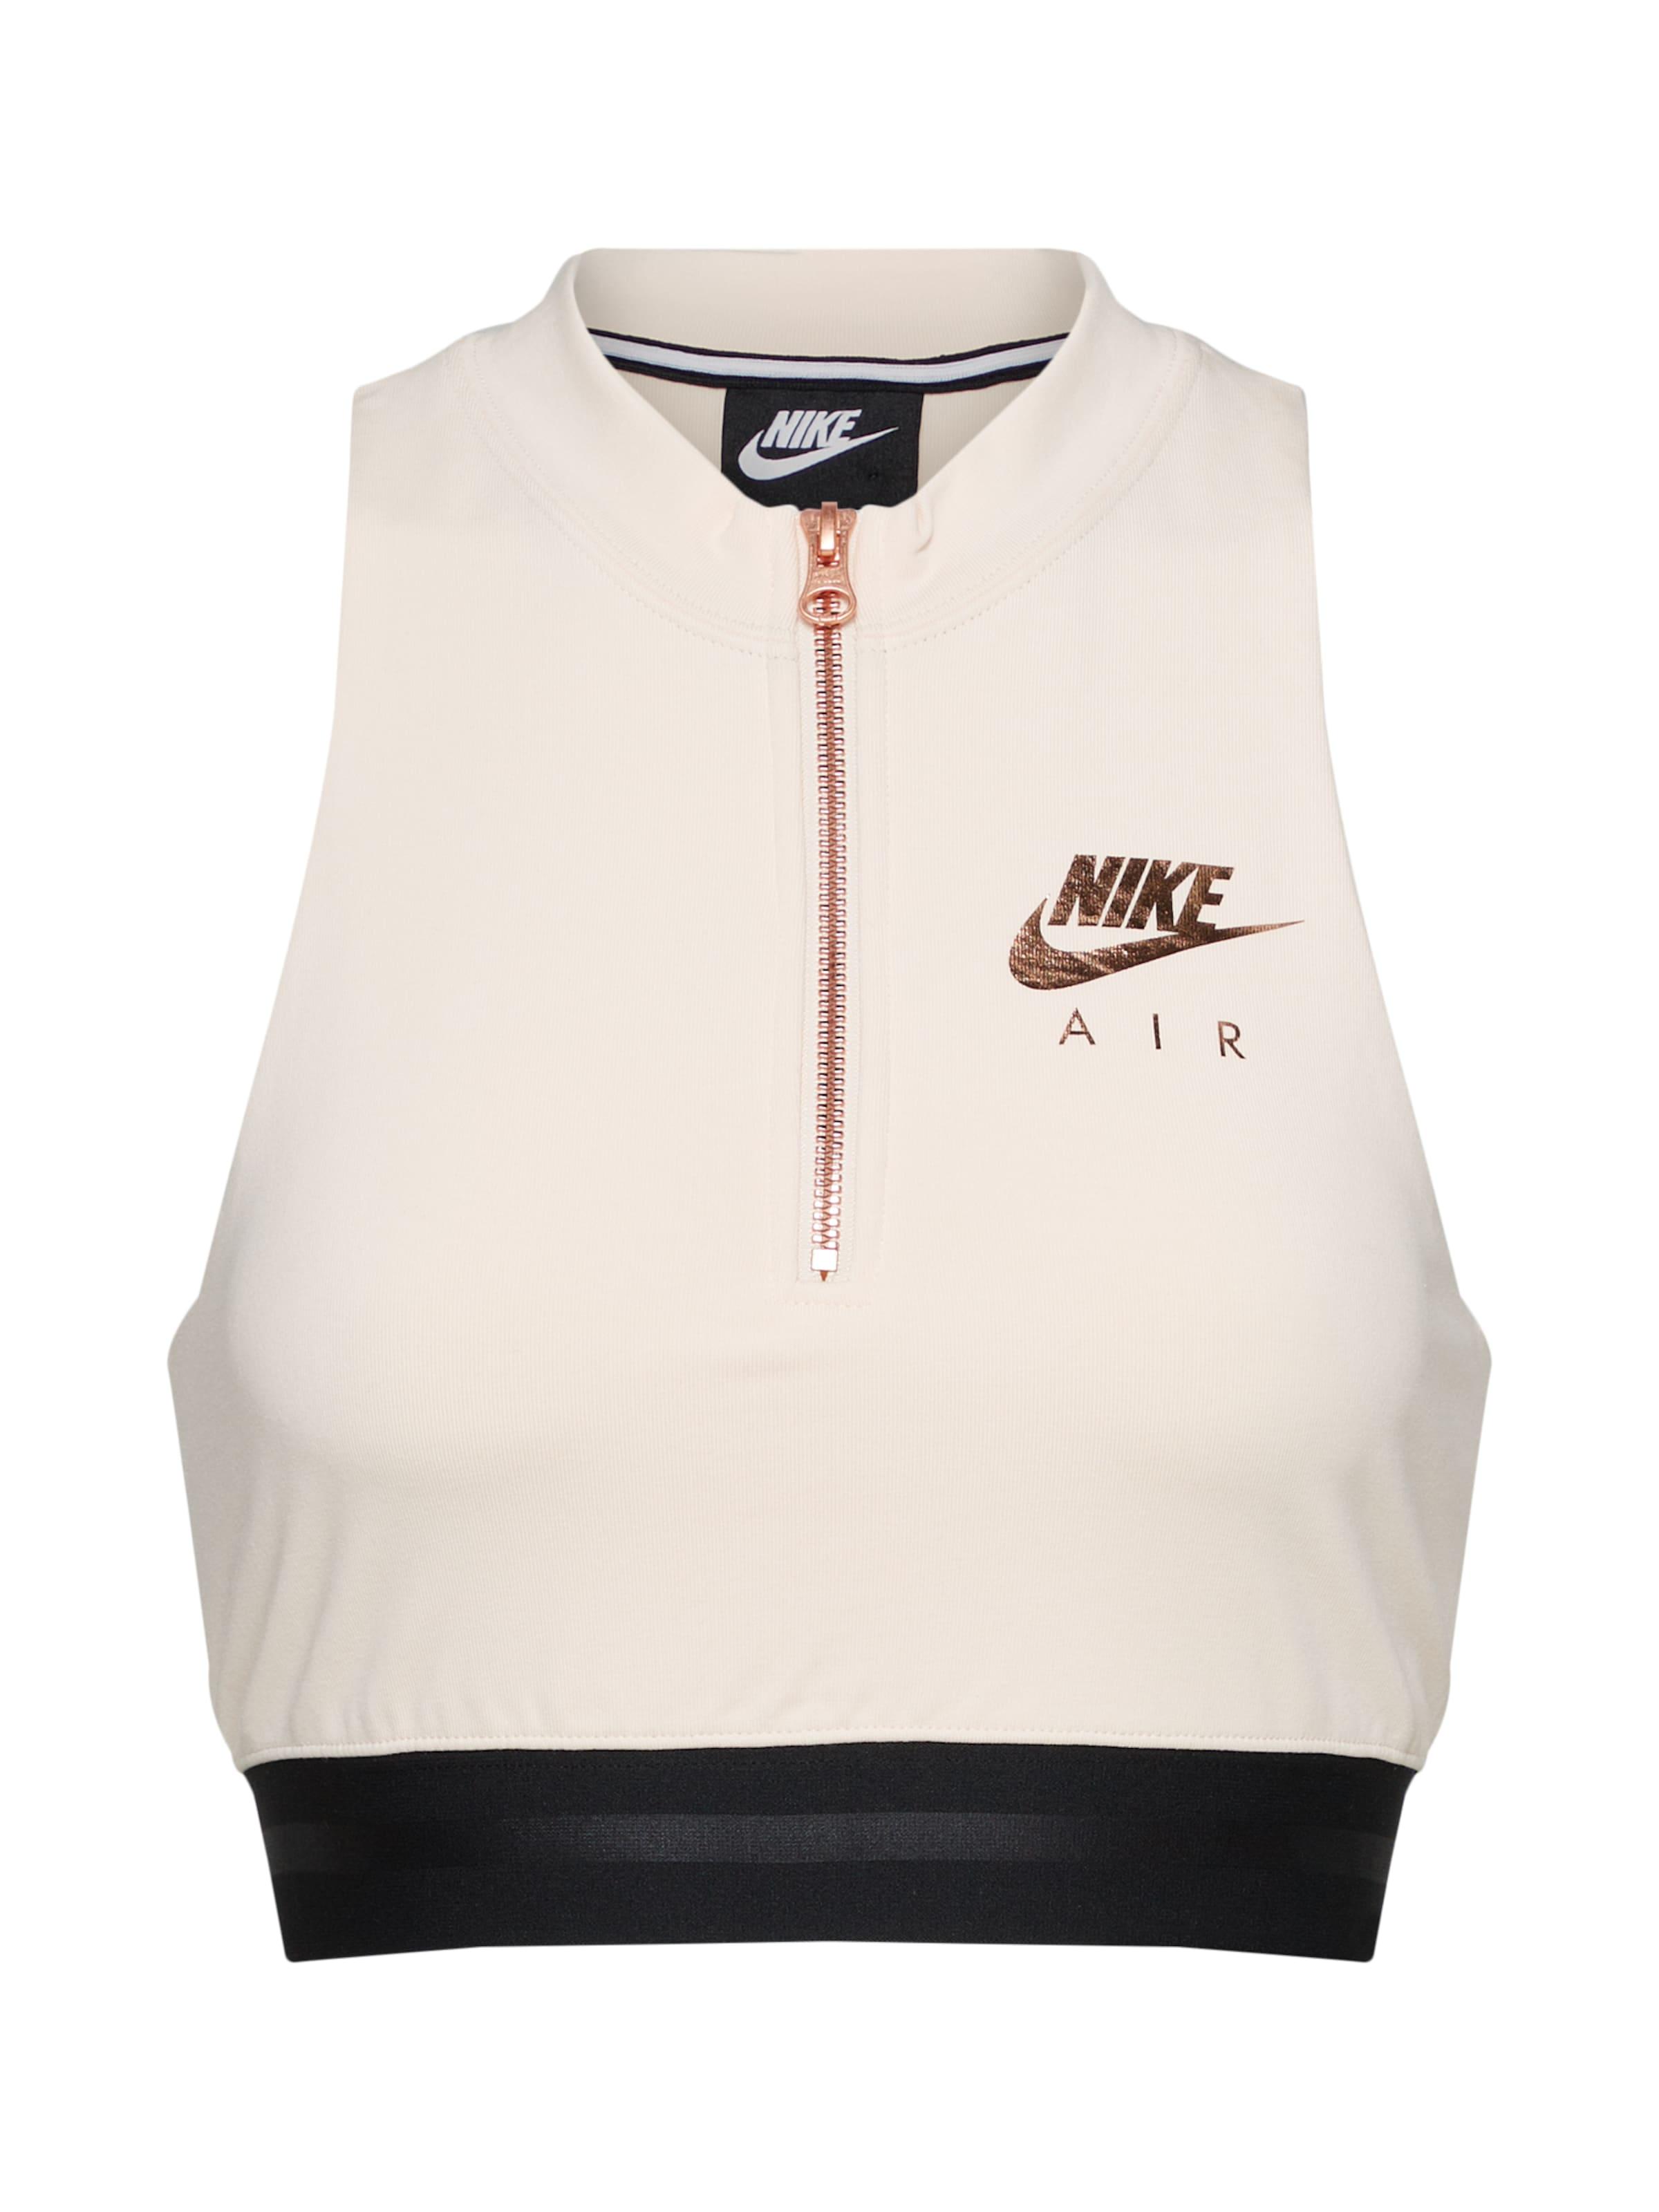 'air Crop' Poudre Haut En Tank Nike Sportswear EW2I9DH